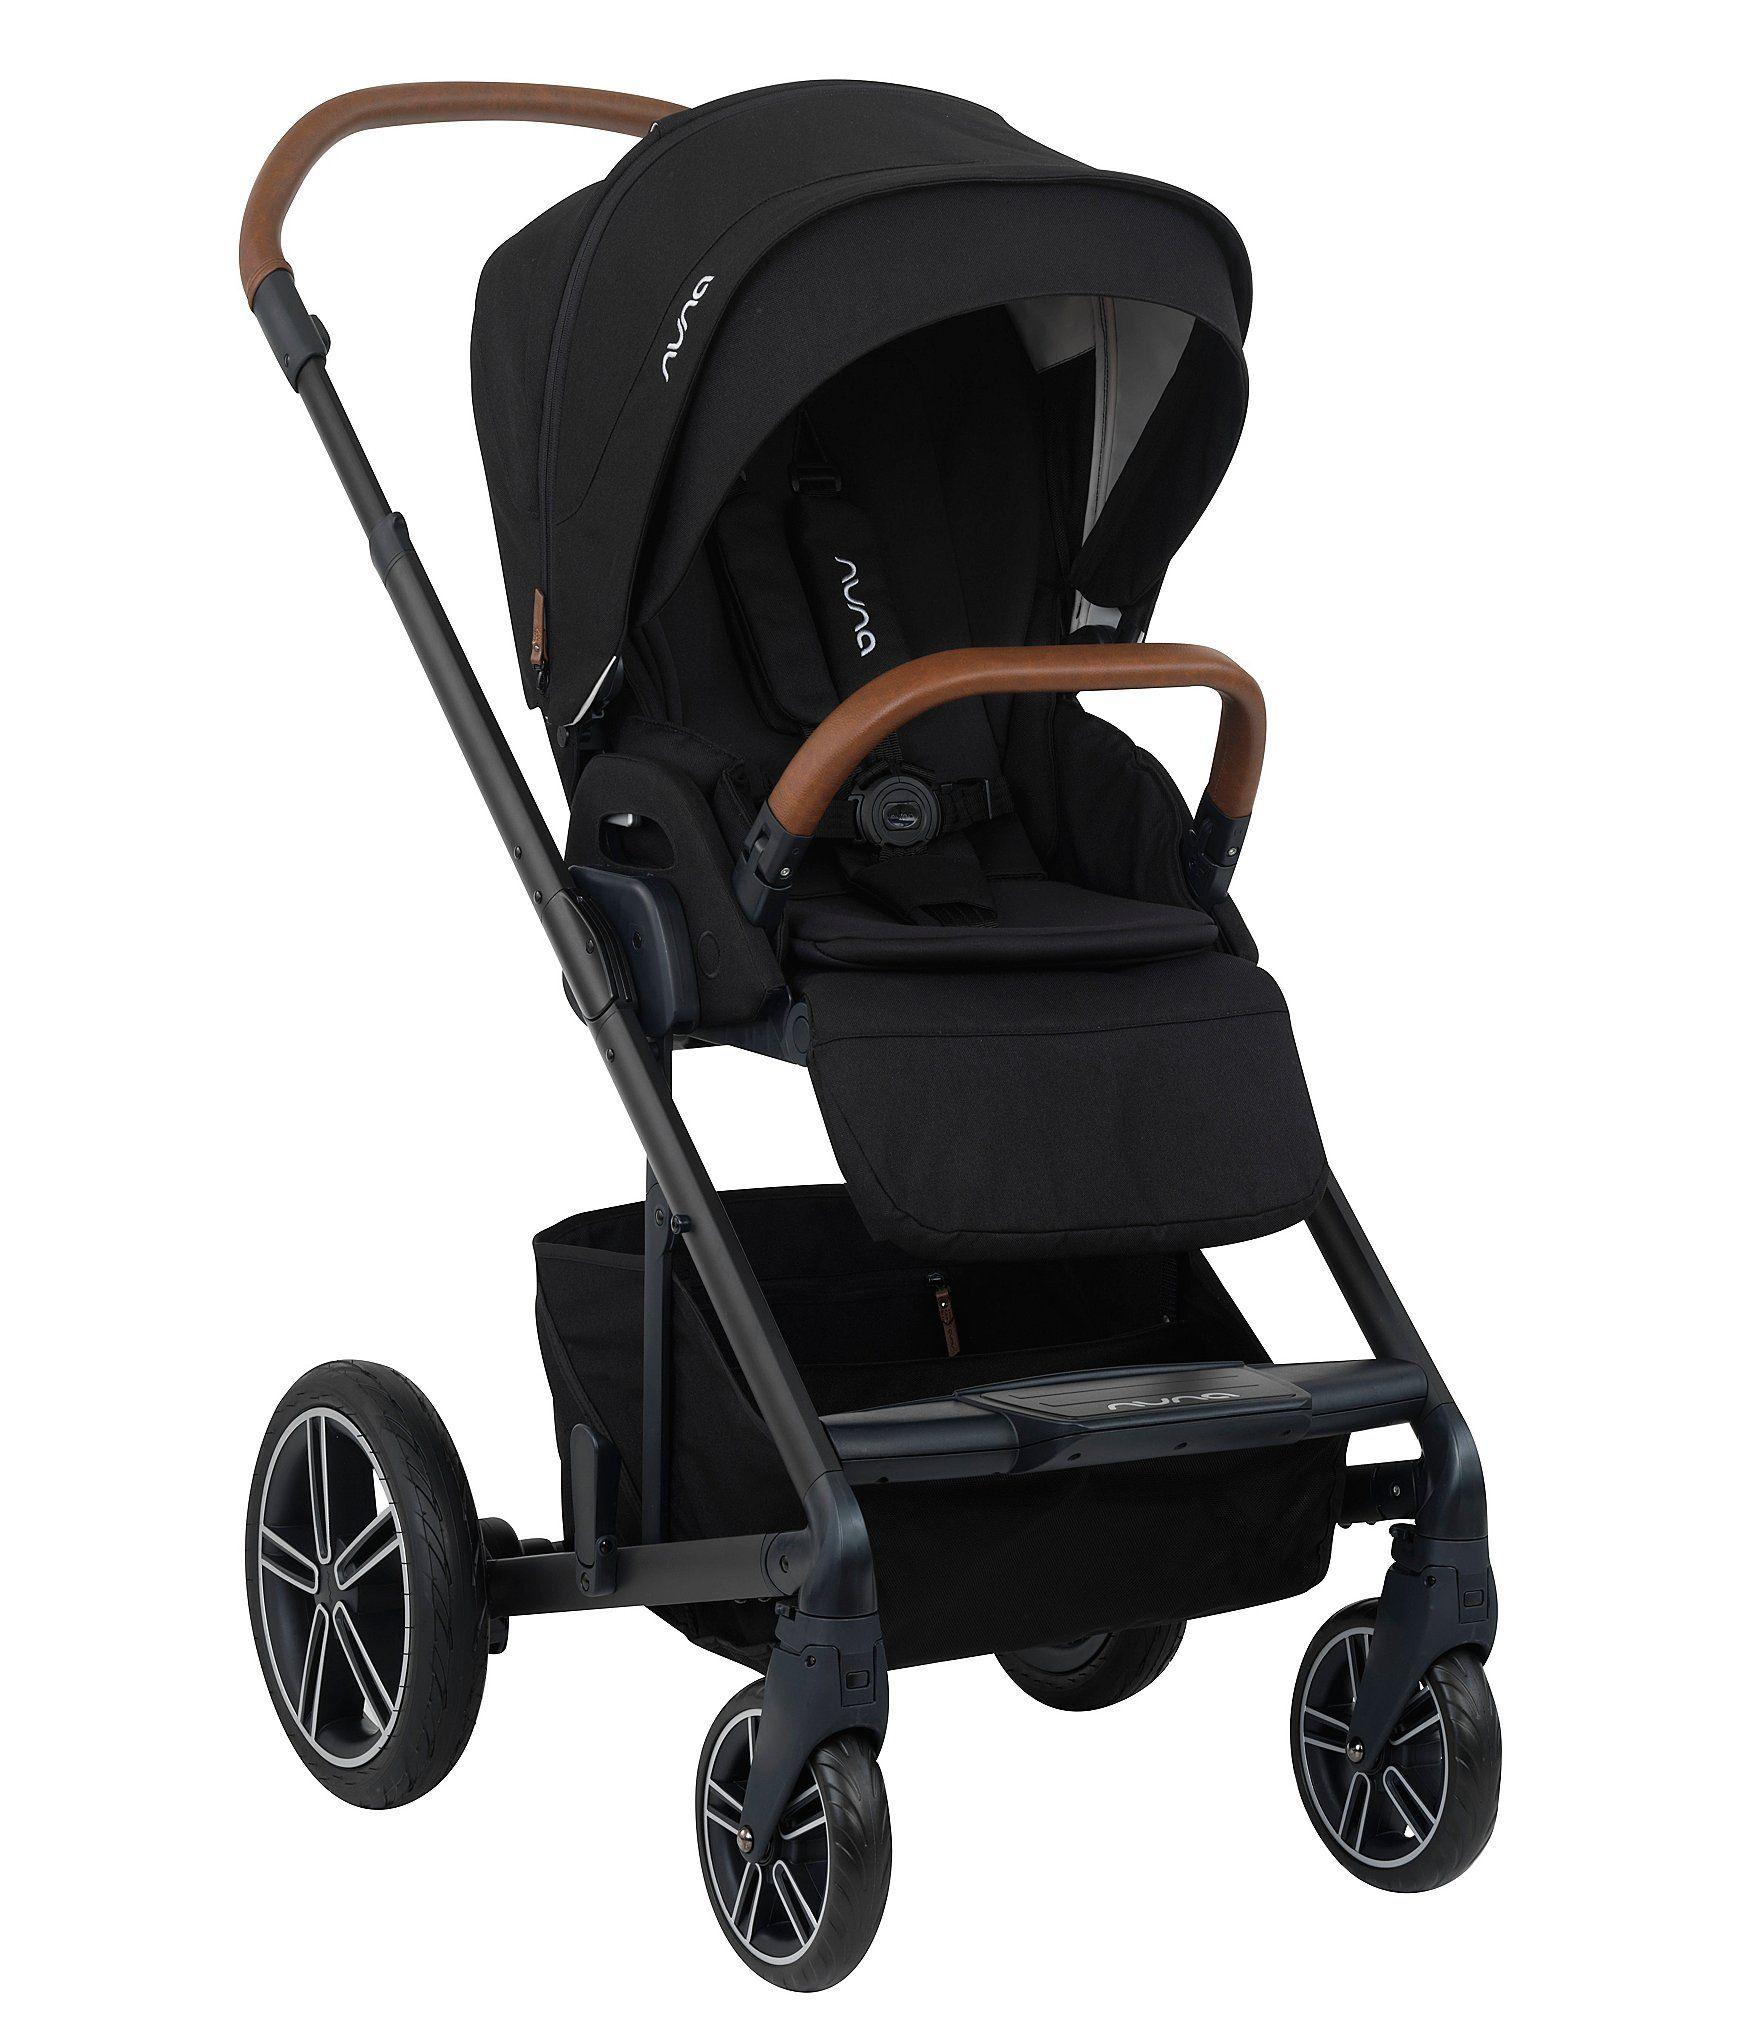 Nuna Mixx Stroller Dillard's in 2020 Nuna mixx